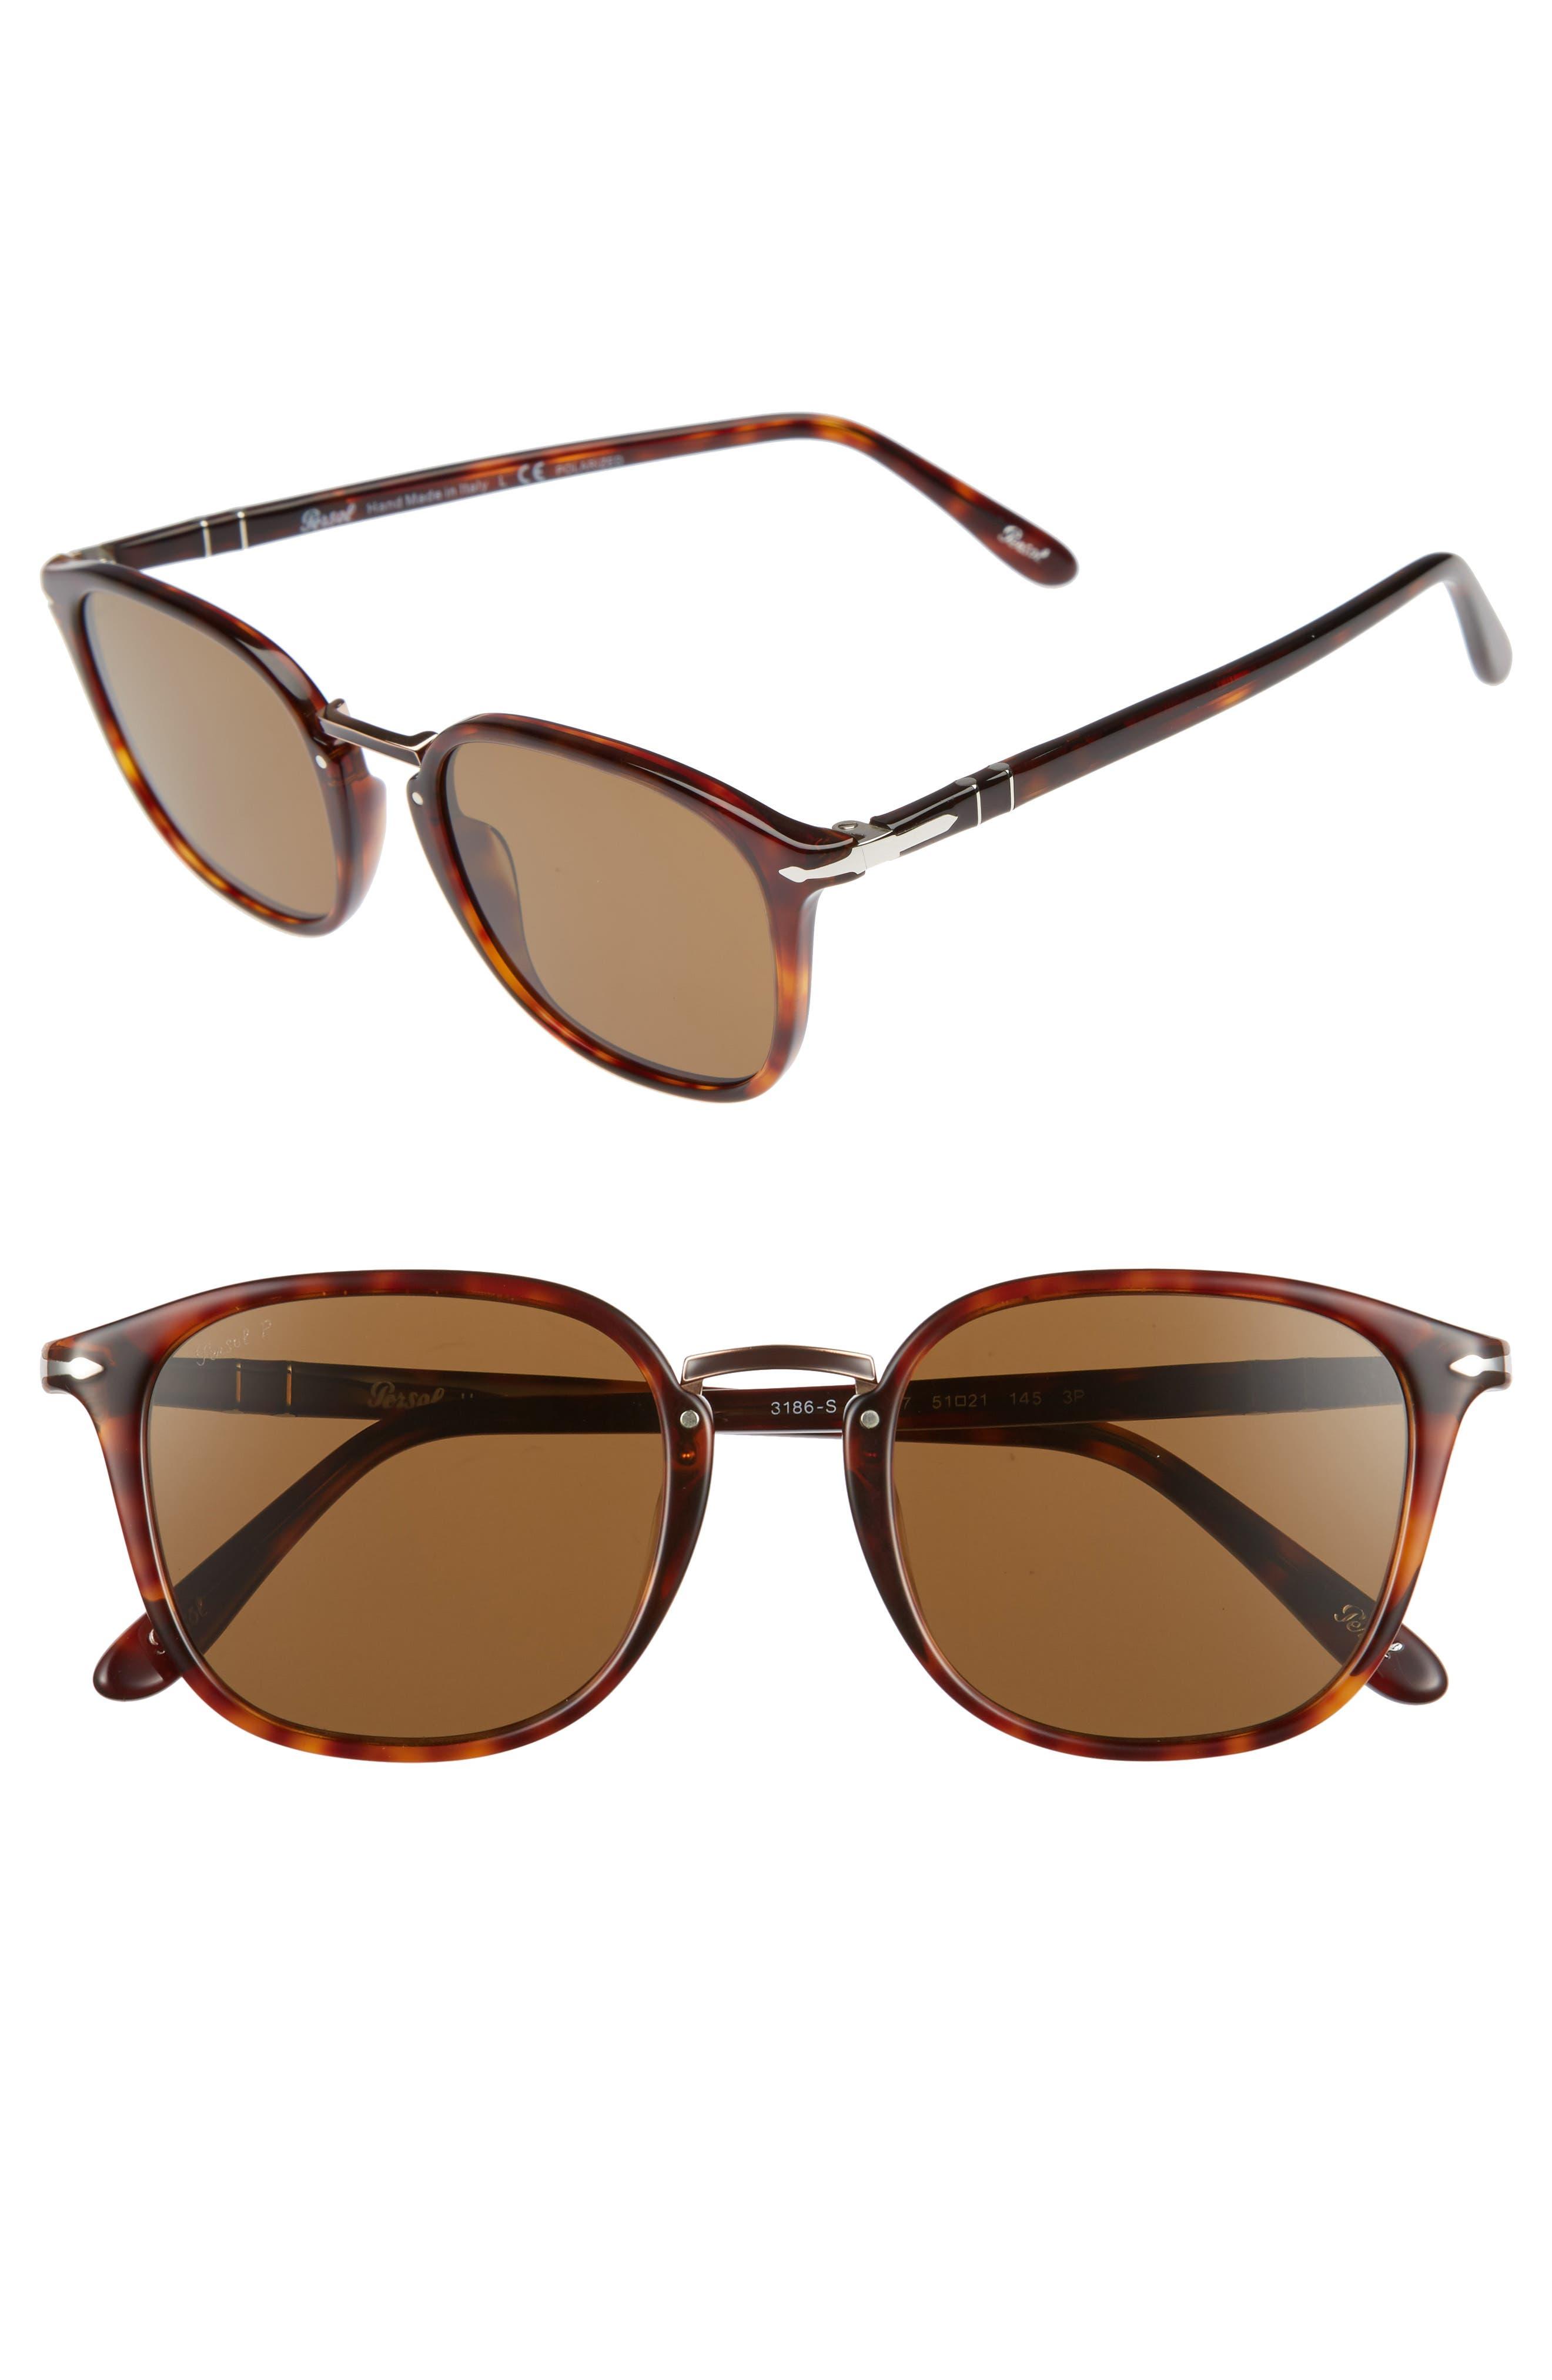 Phantos 51mm Polarized Sunglasses,                             Main thumbnail 1, color,                             234